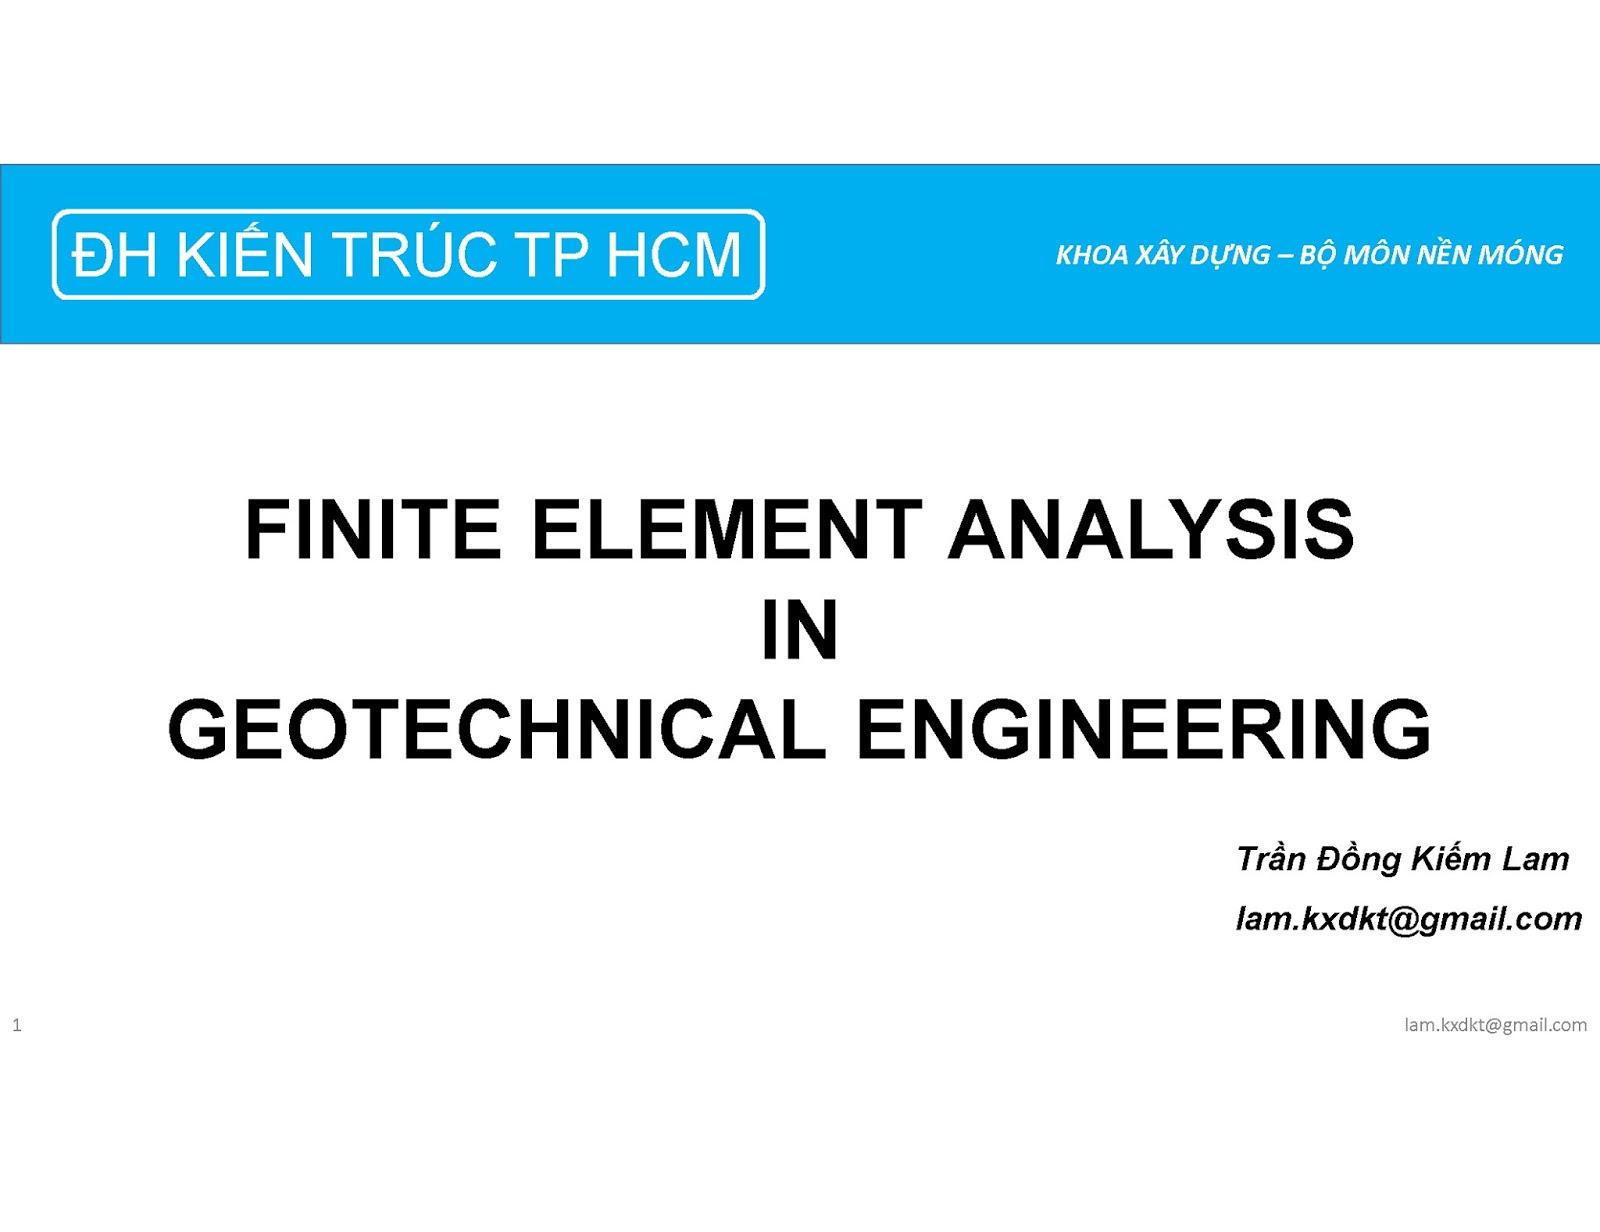 Finite Element Analysis In Geotechnical Engineering_KTL